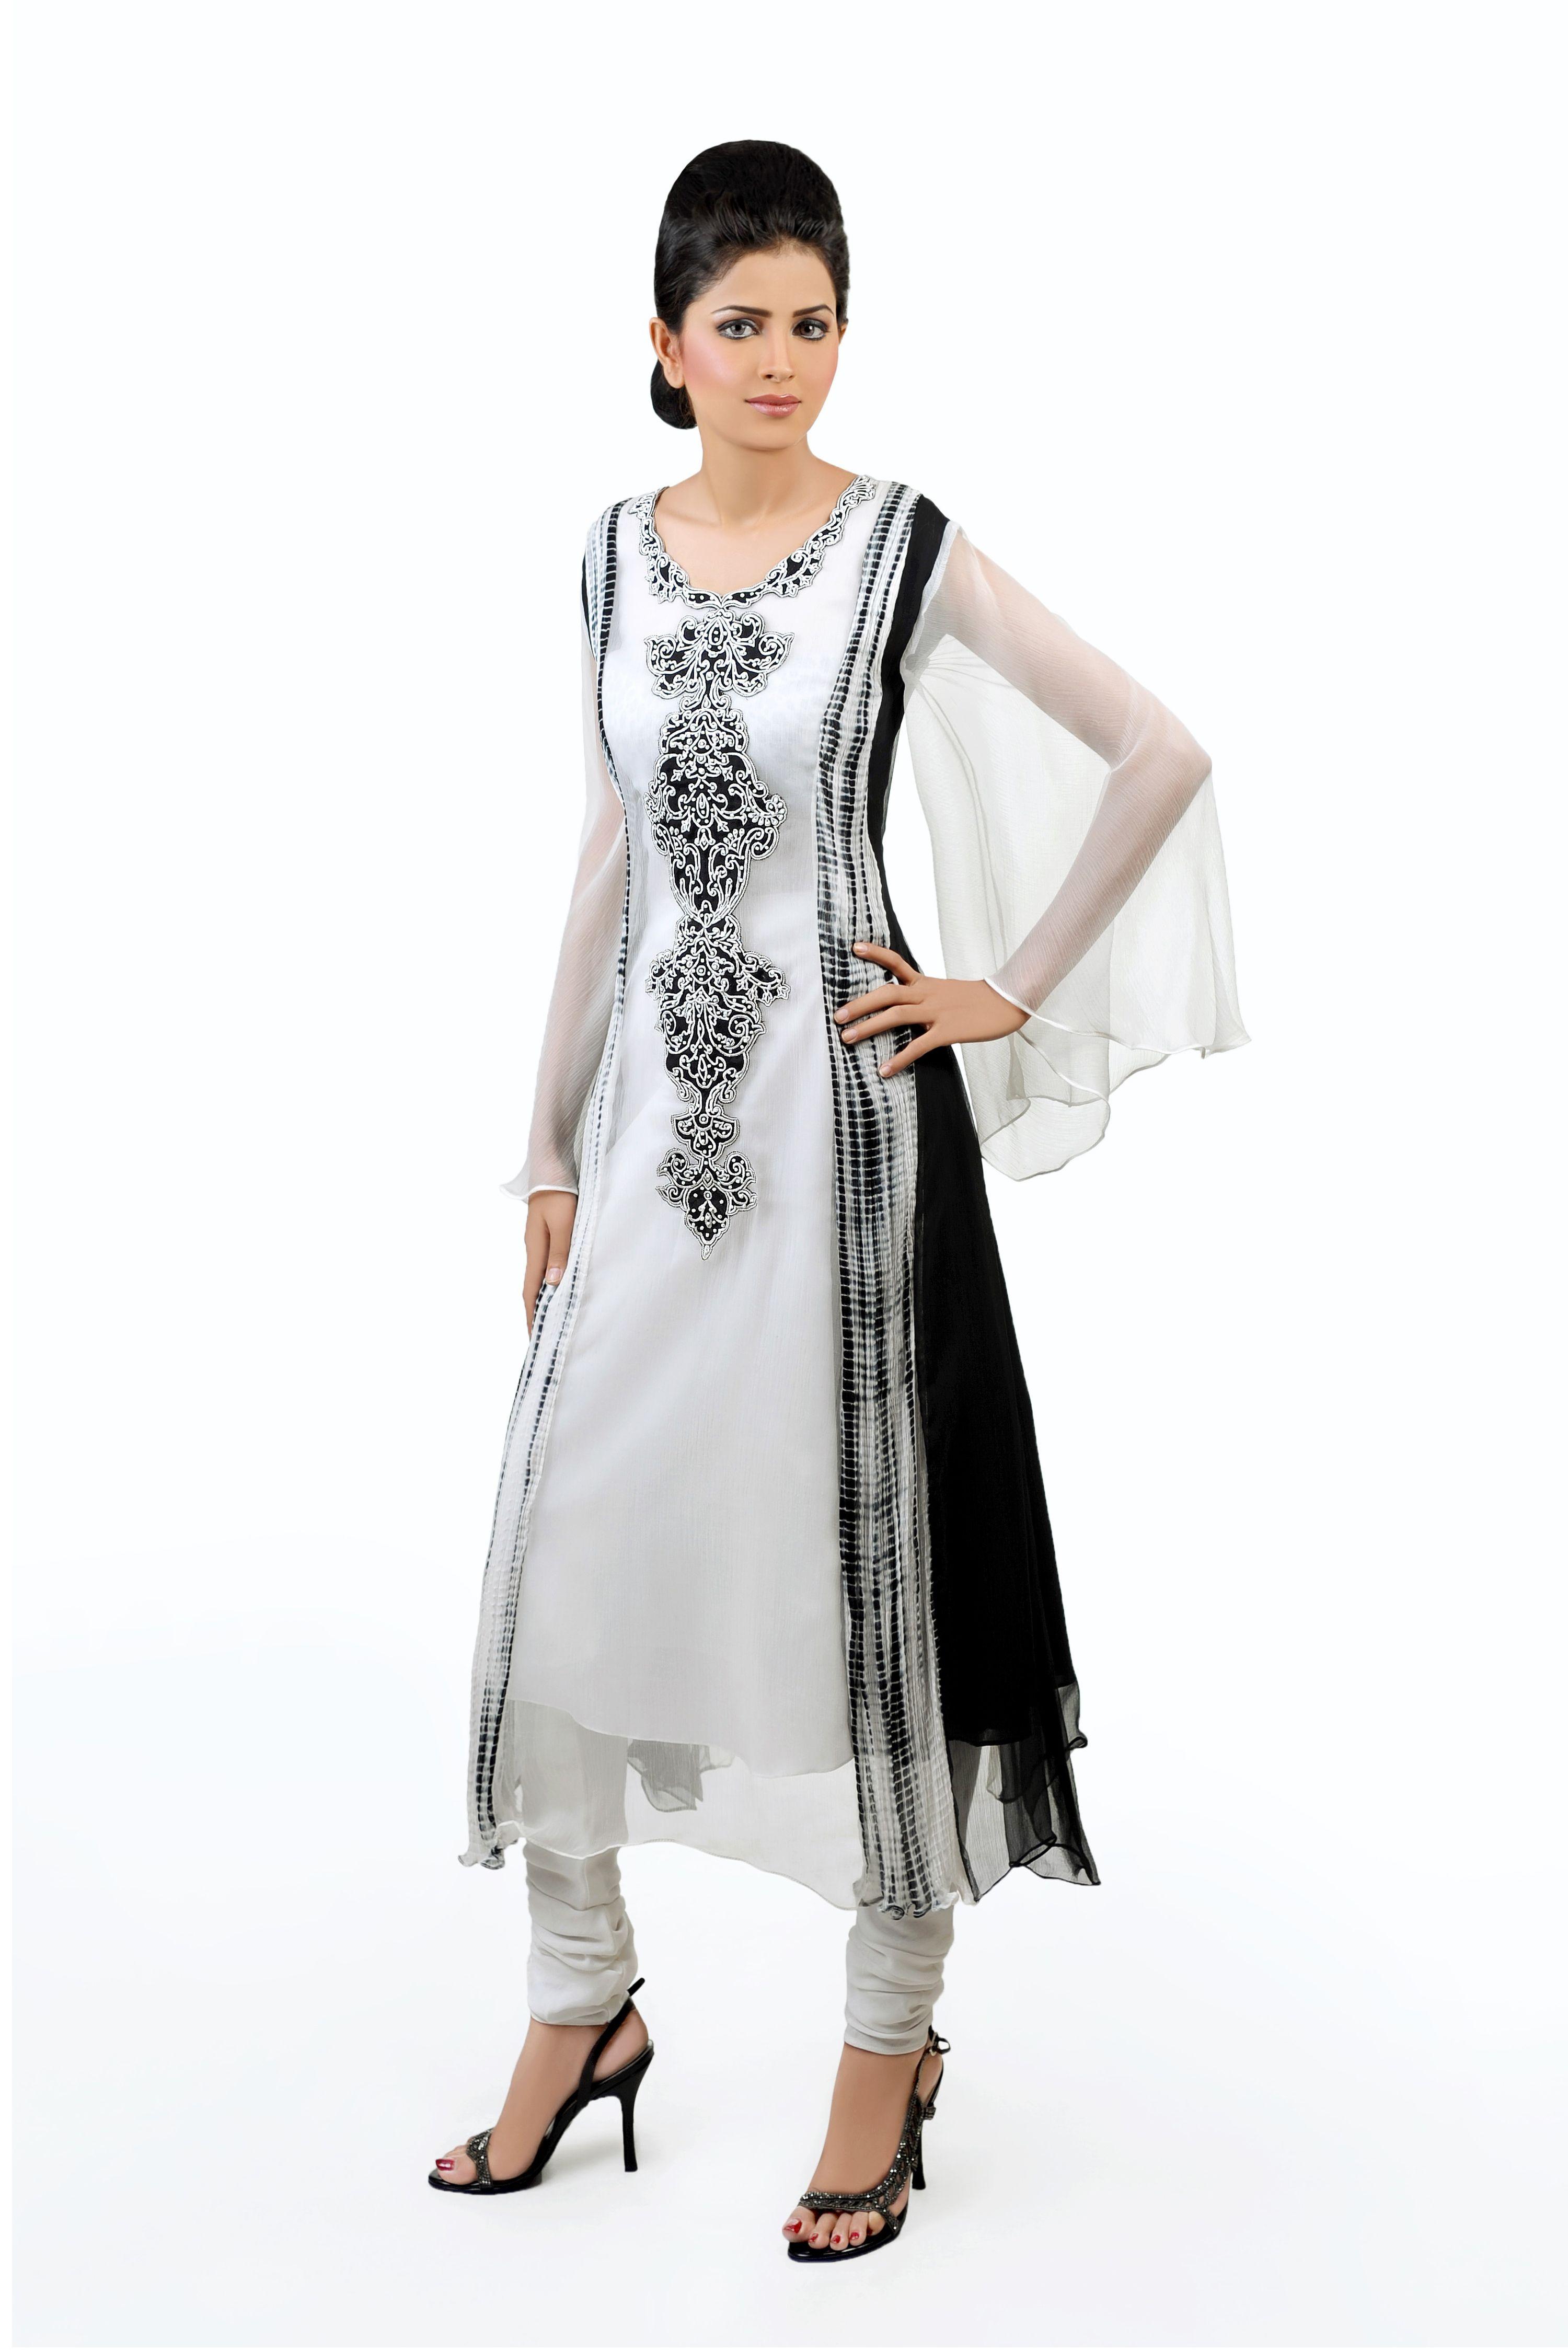 very beautiful dress and shoes | unze ladies dresses | Pinterest ...